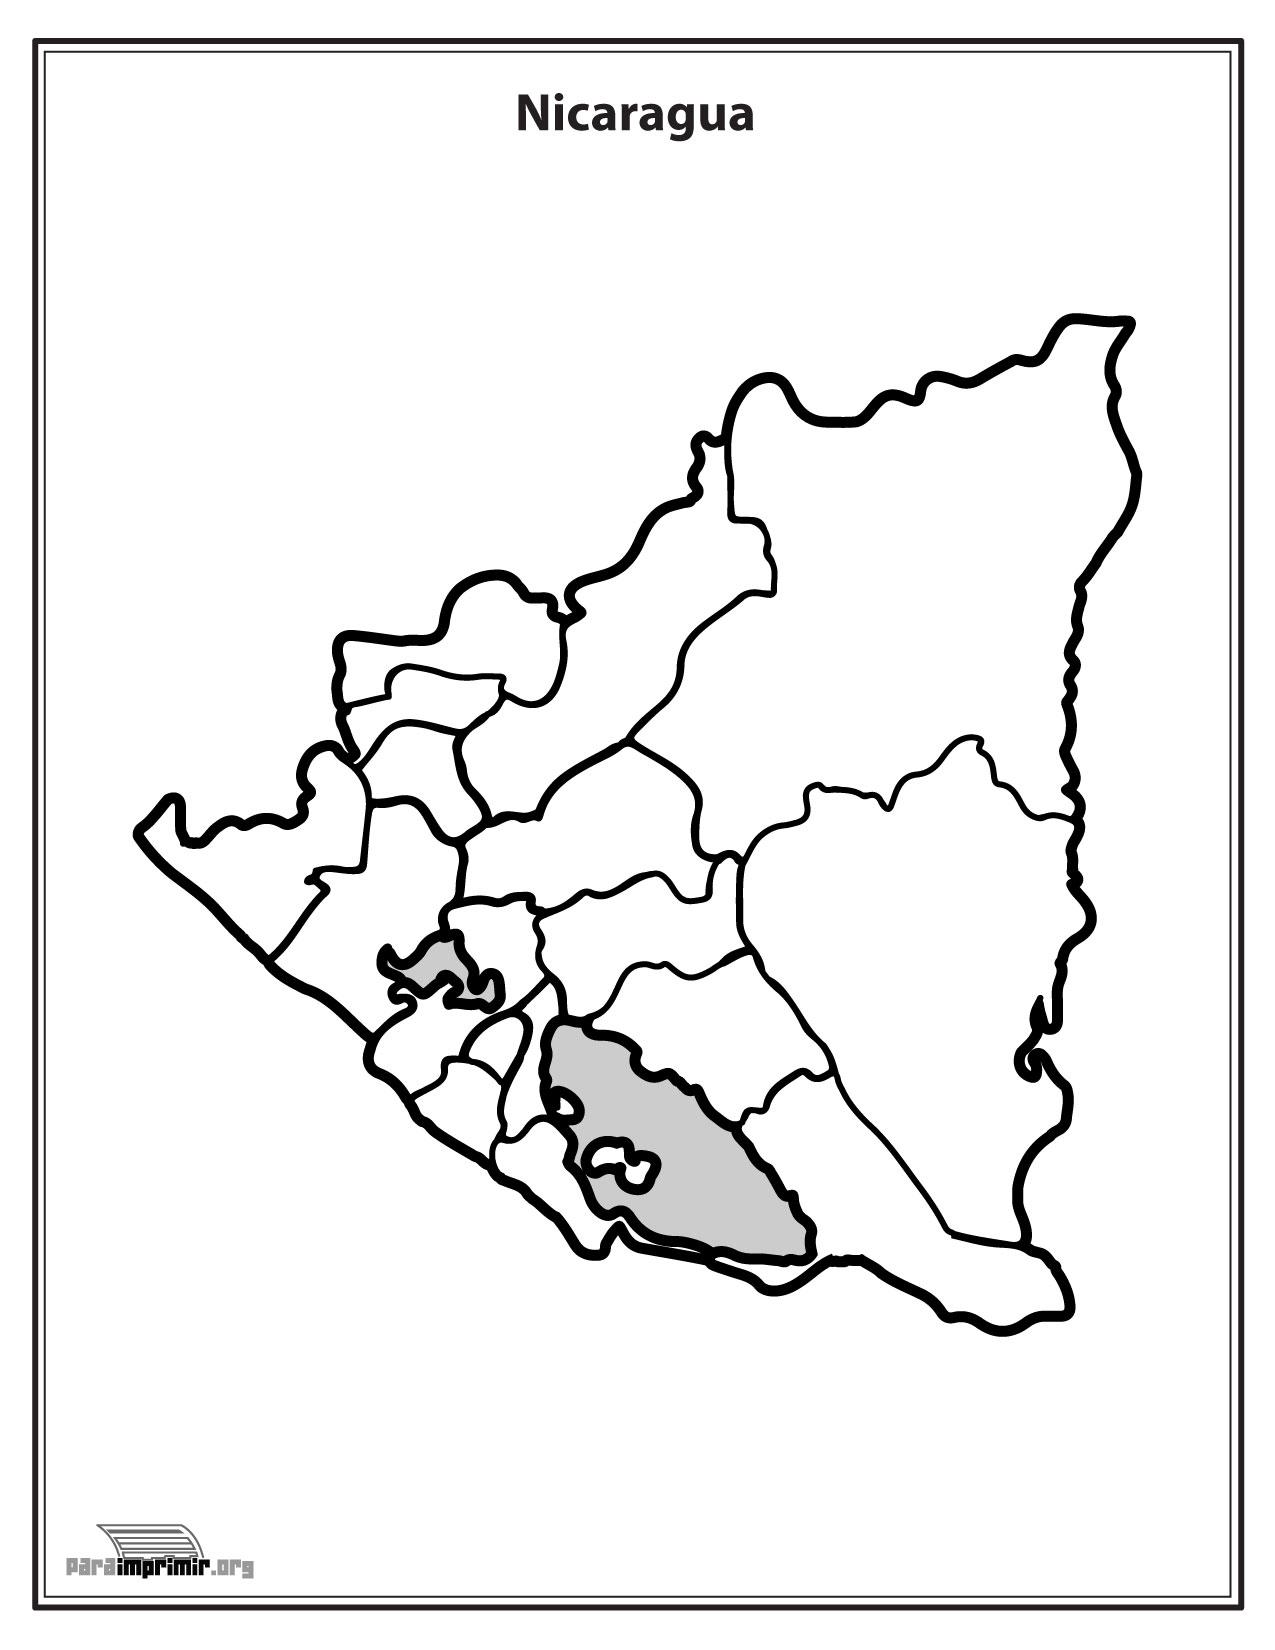 de Nicaragua sin nombres para imprimir